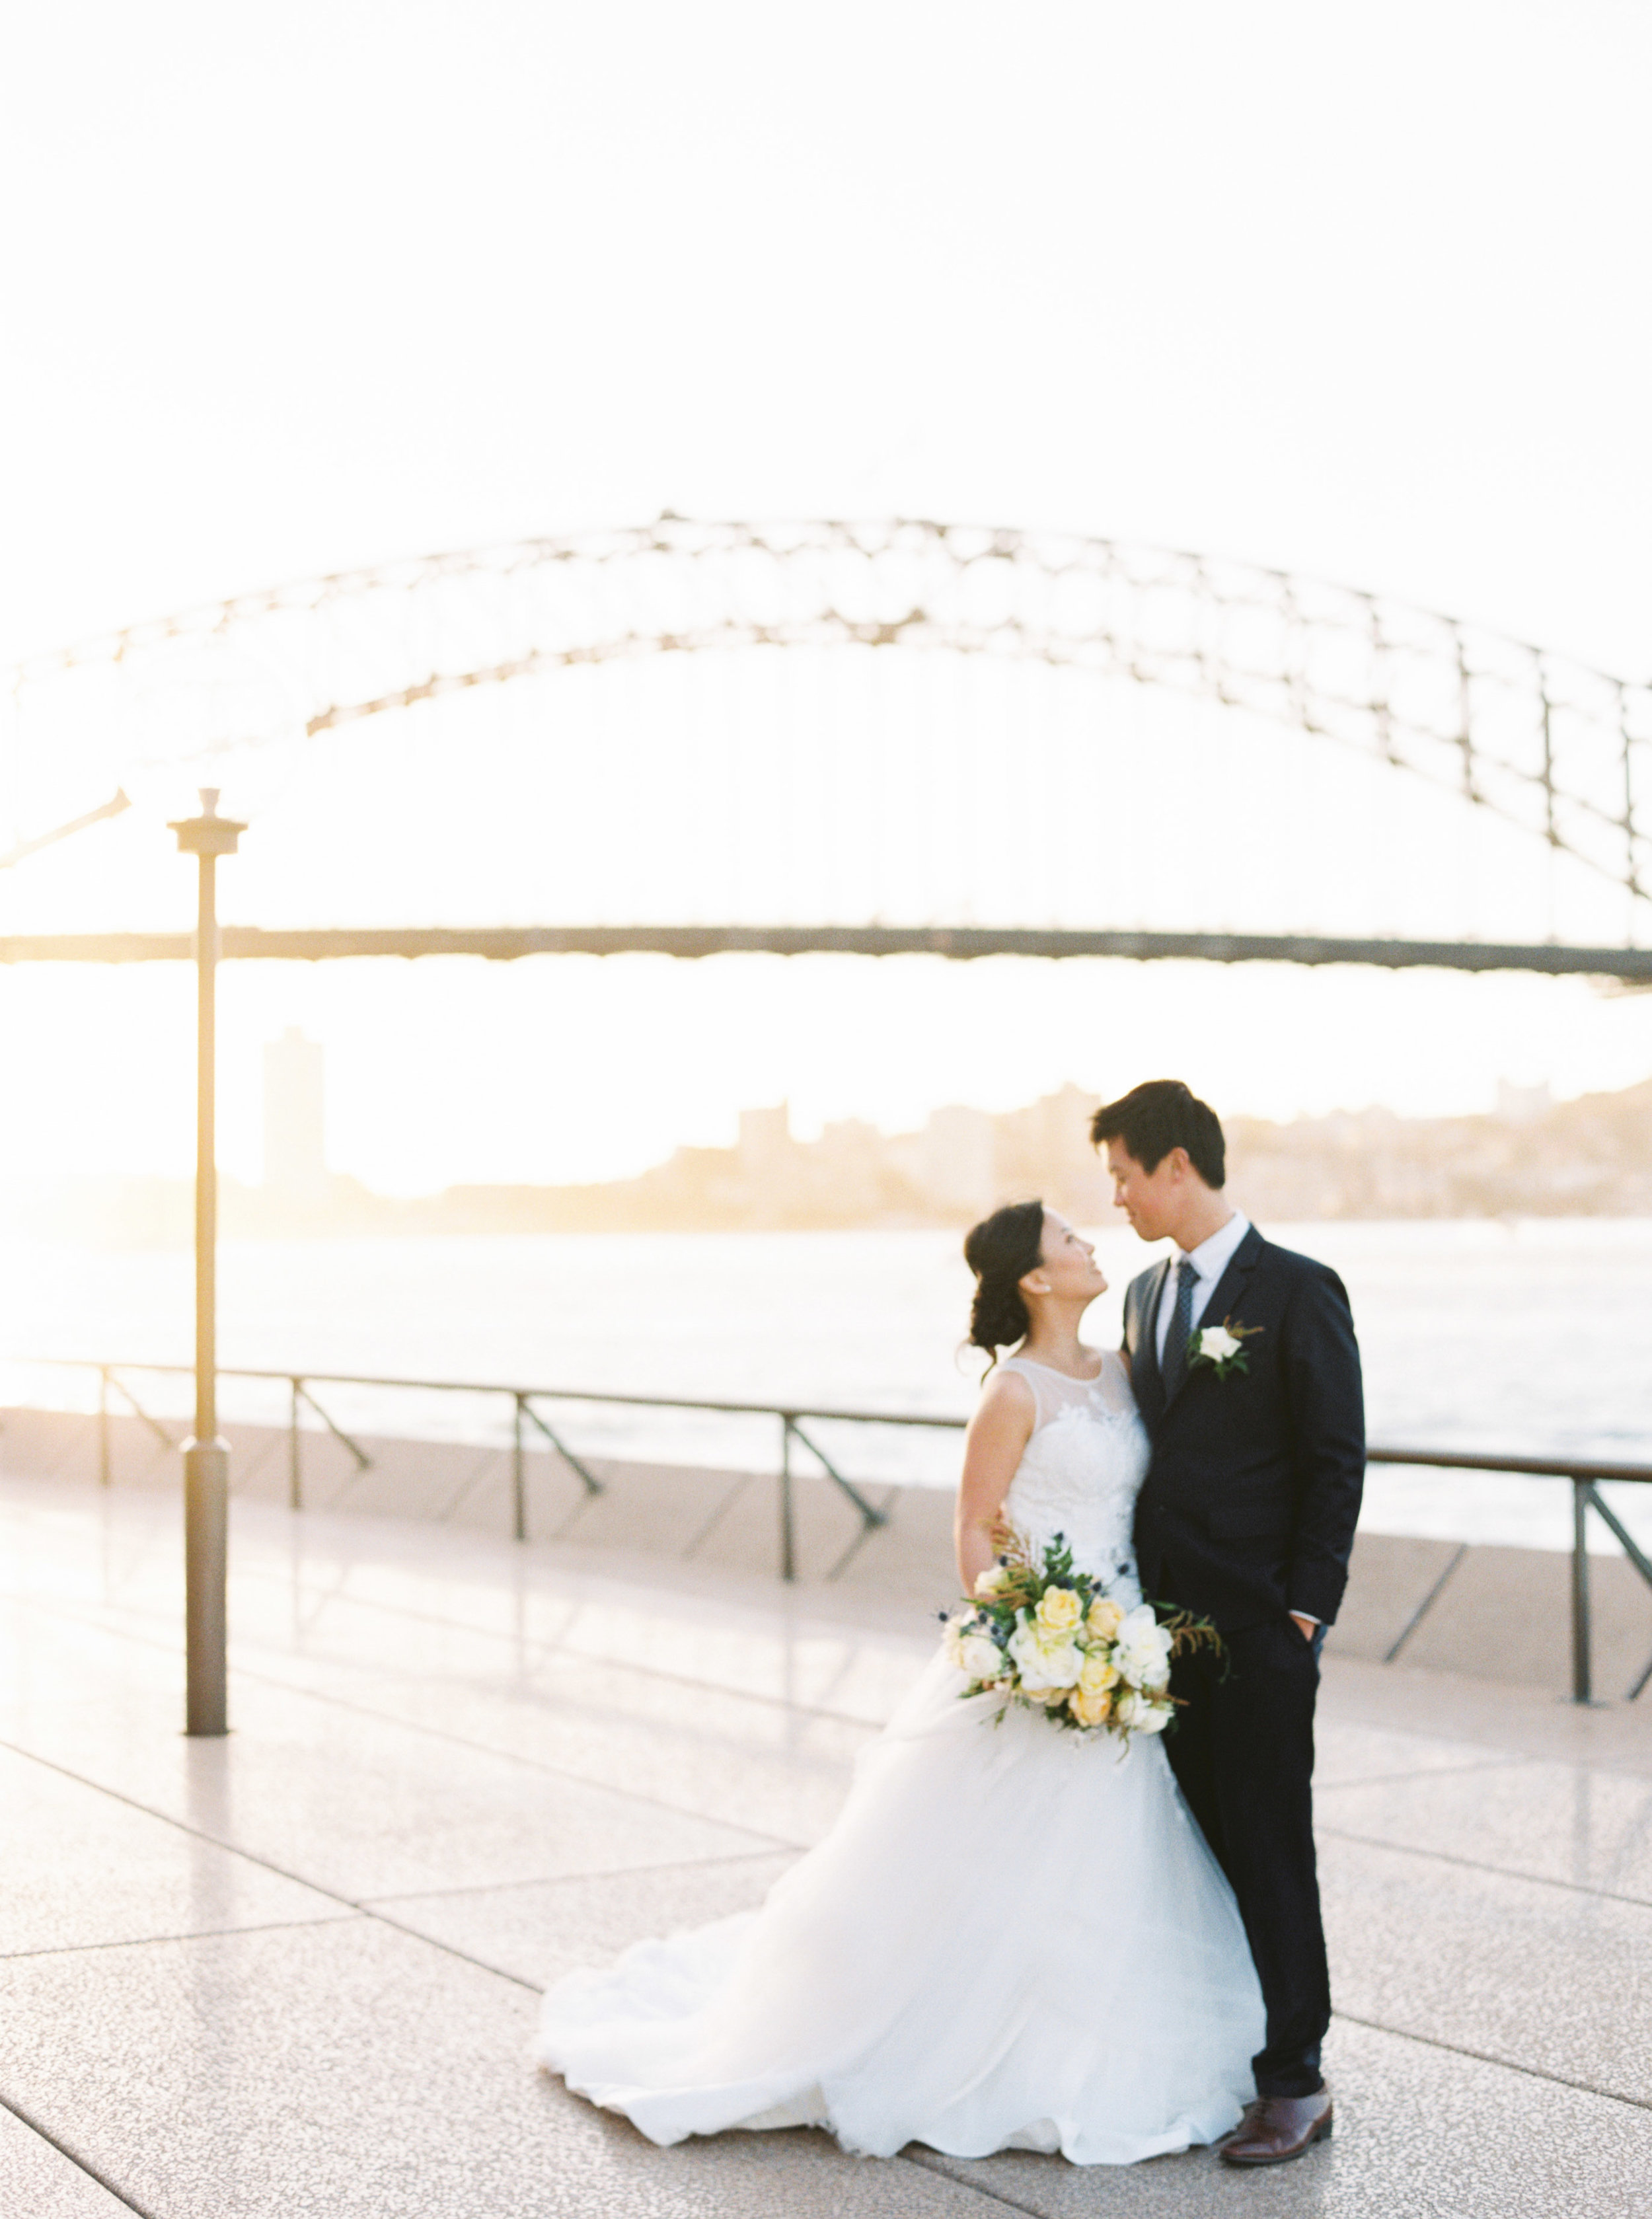 00038- Australia Sydney Wedding Photographer Sheri McMahon.jpg